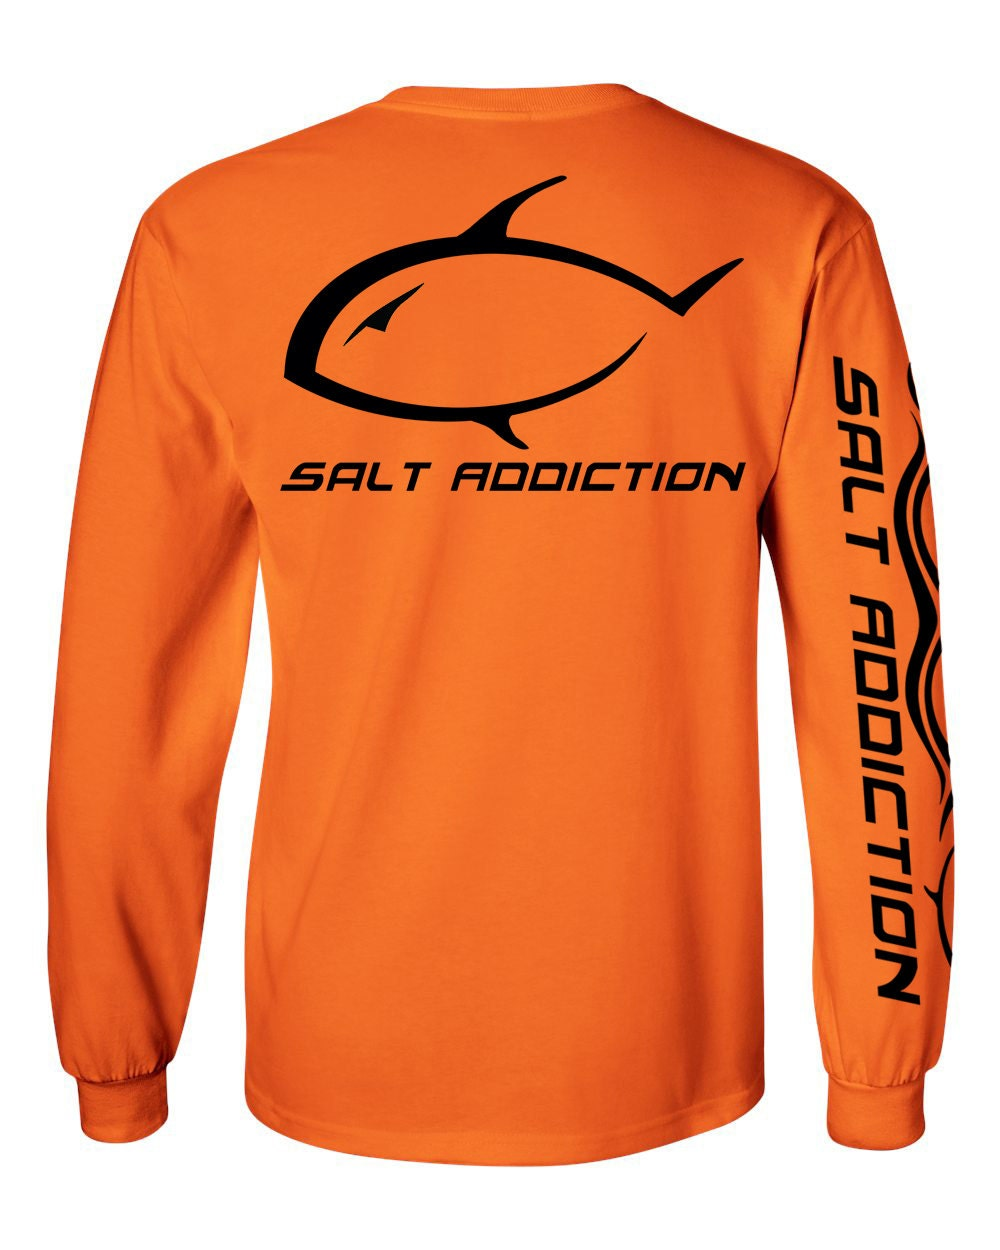 Salt addiction logo t shirtpermitsaltwater fishing t for Custom saltwater fishing shirts